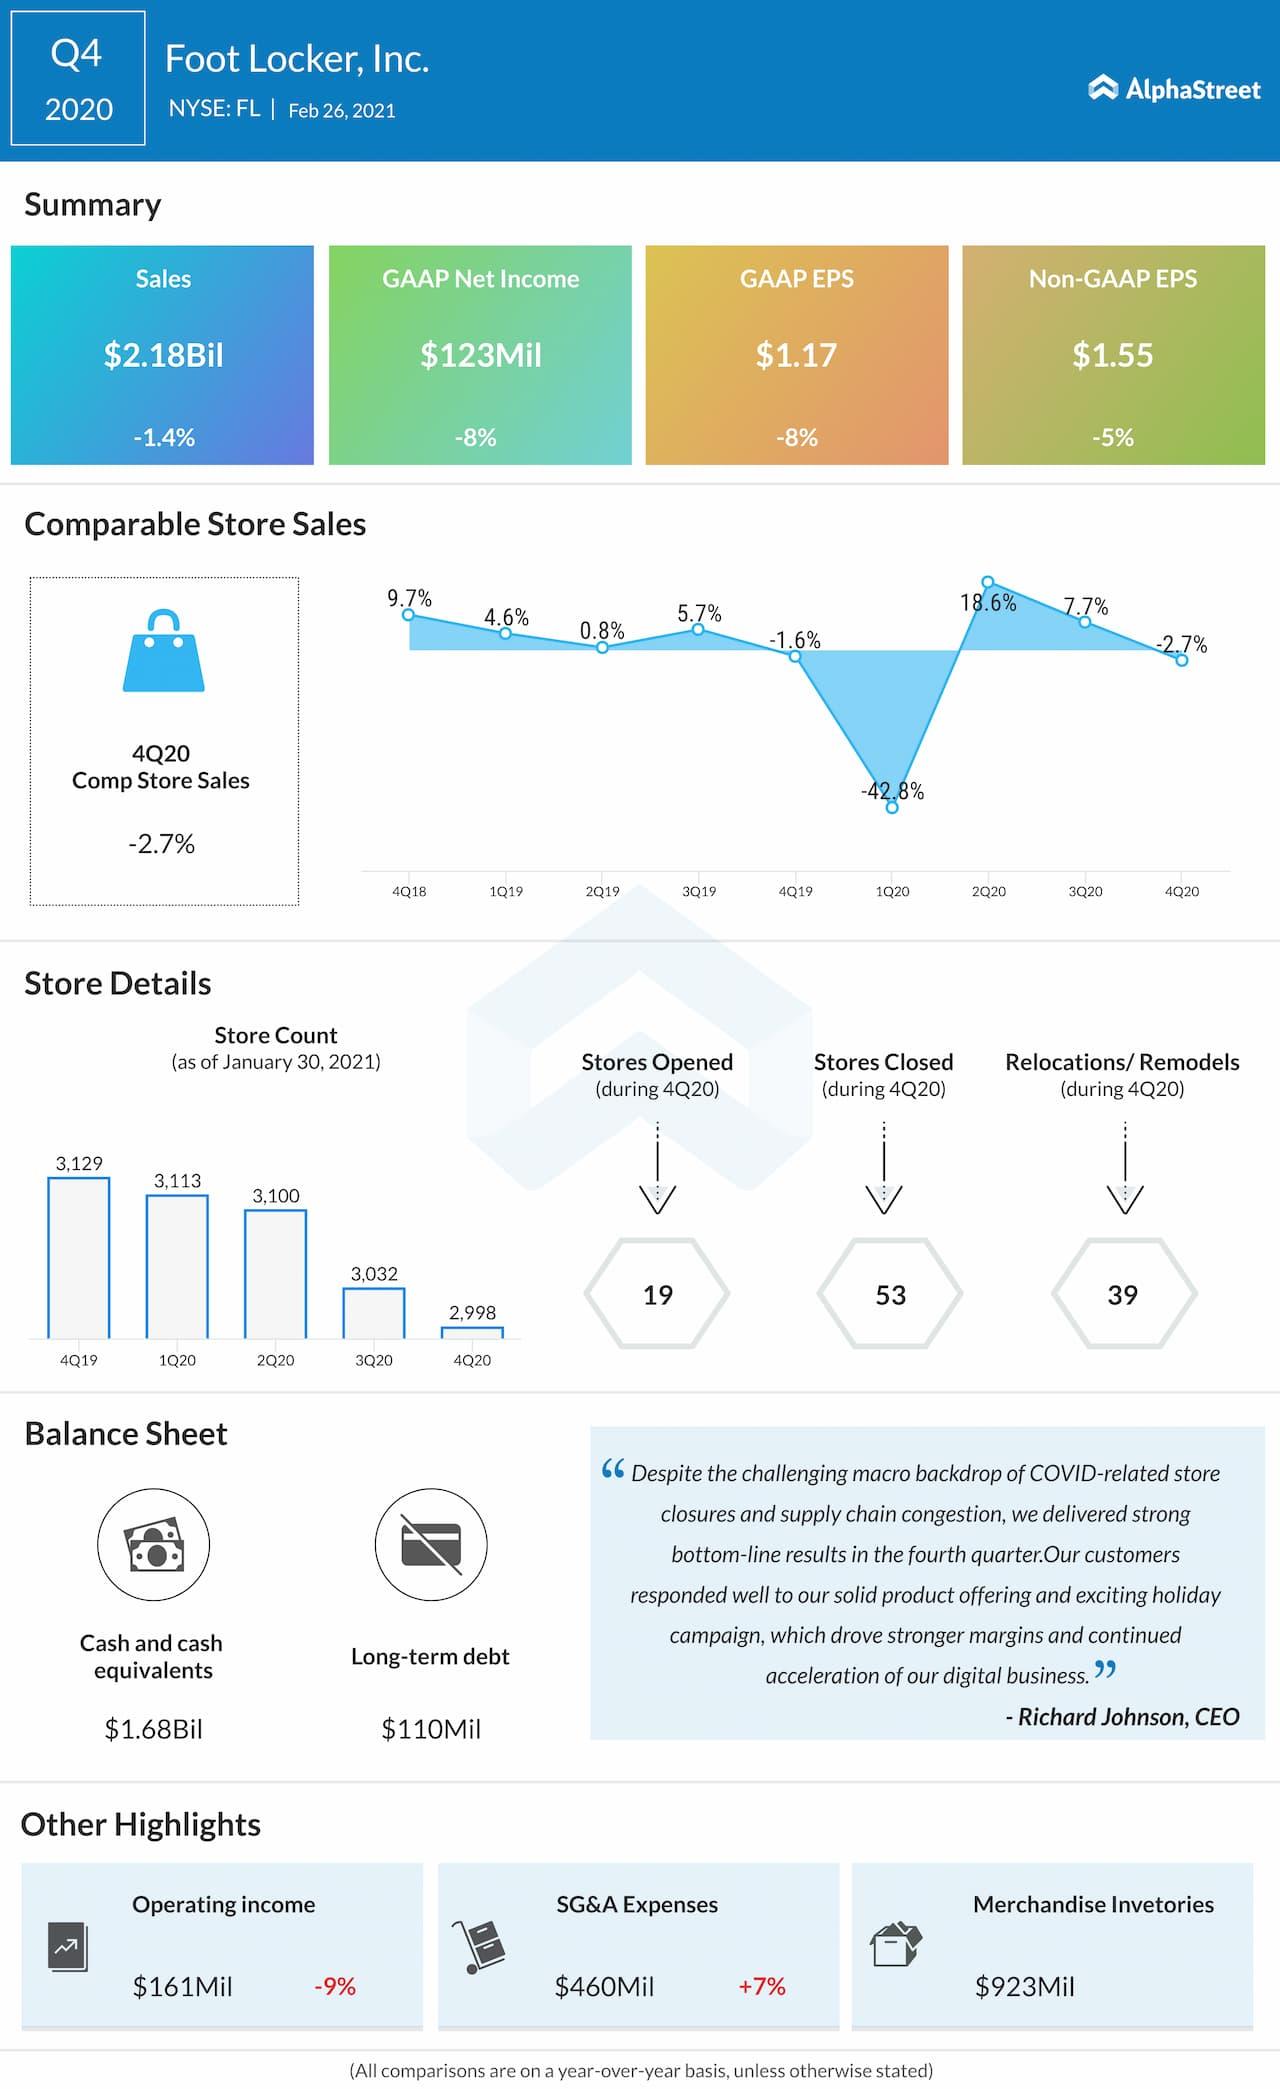 Foot Locker Q4 2020 earnings infographic